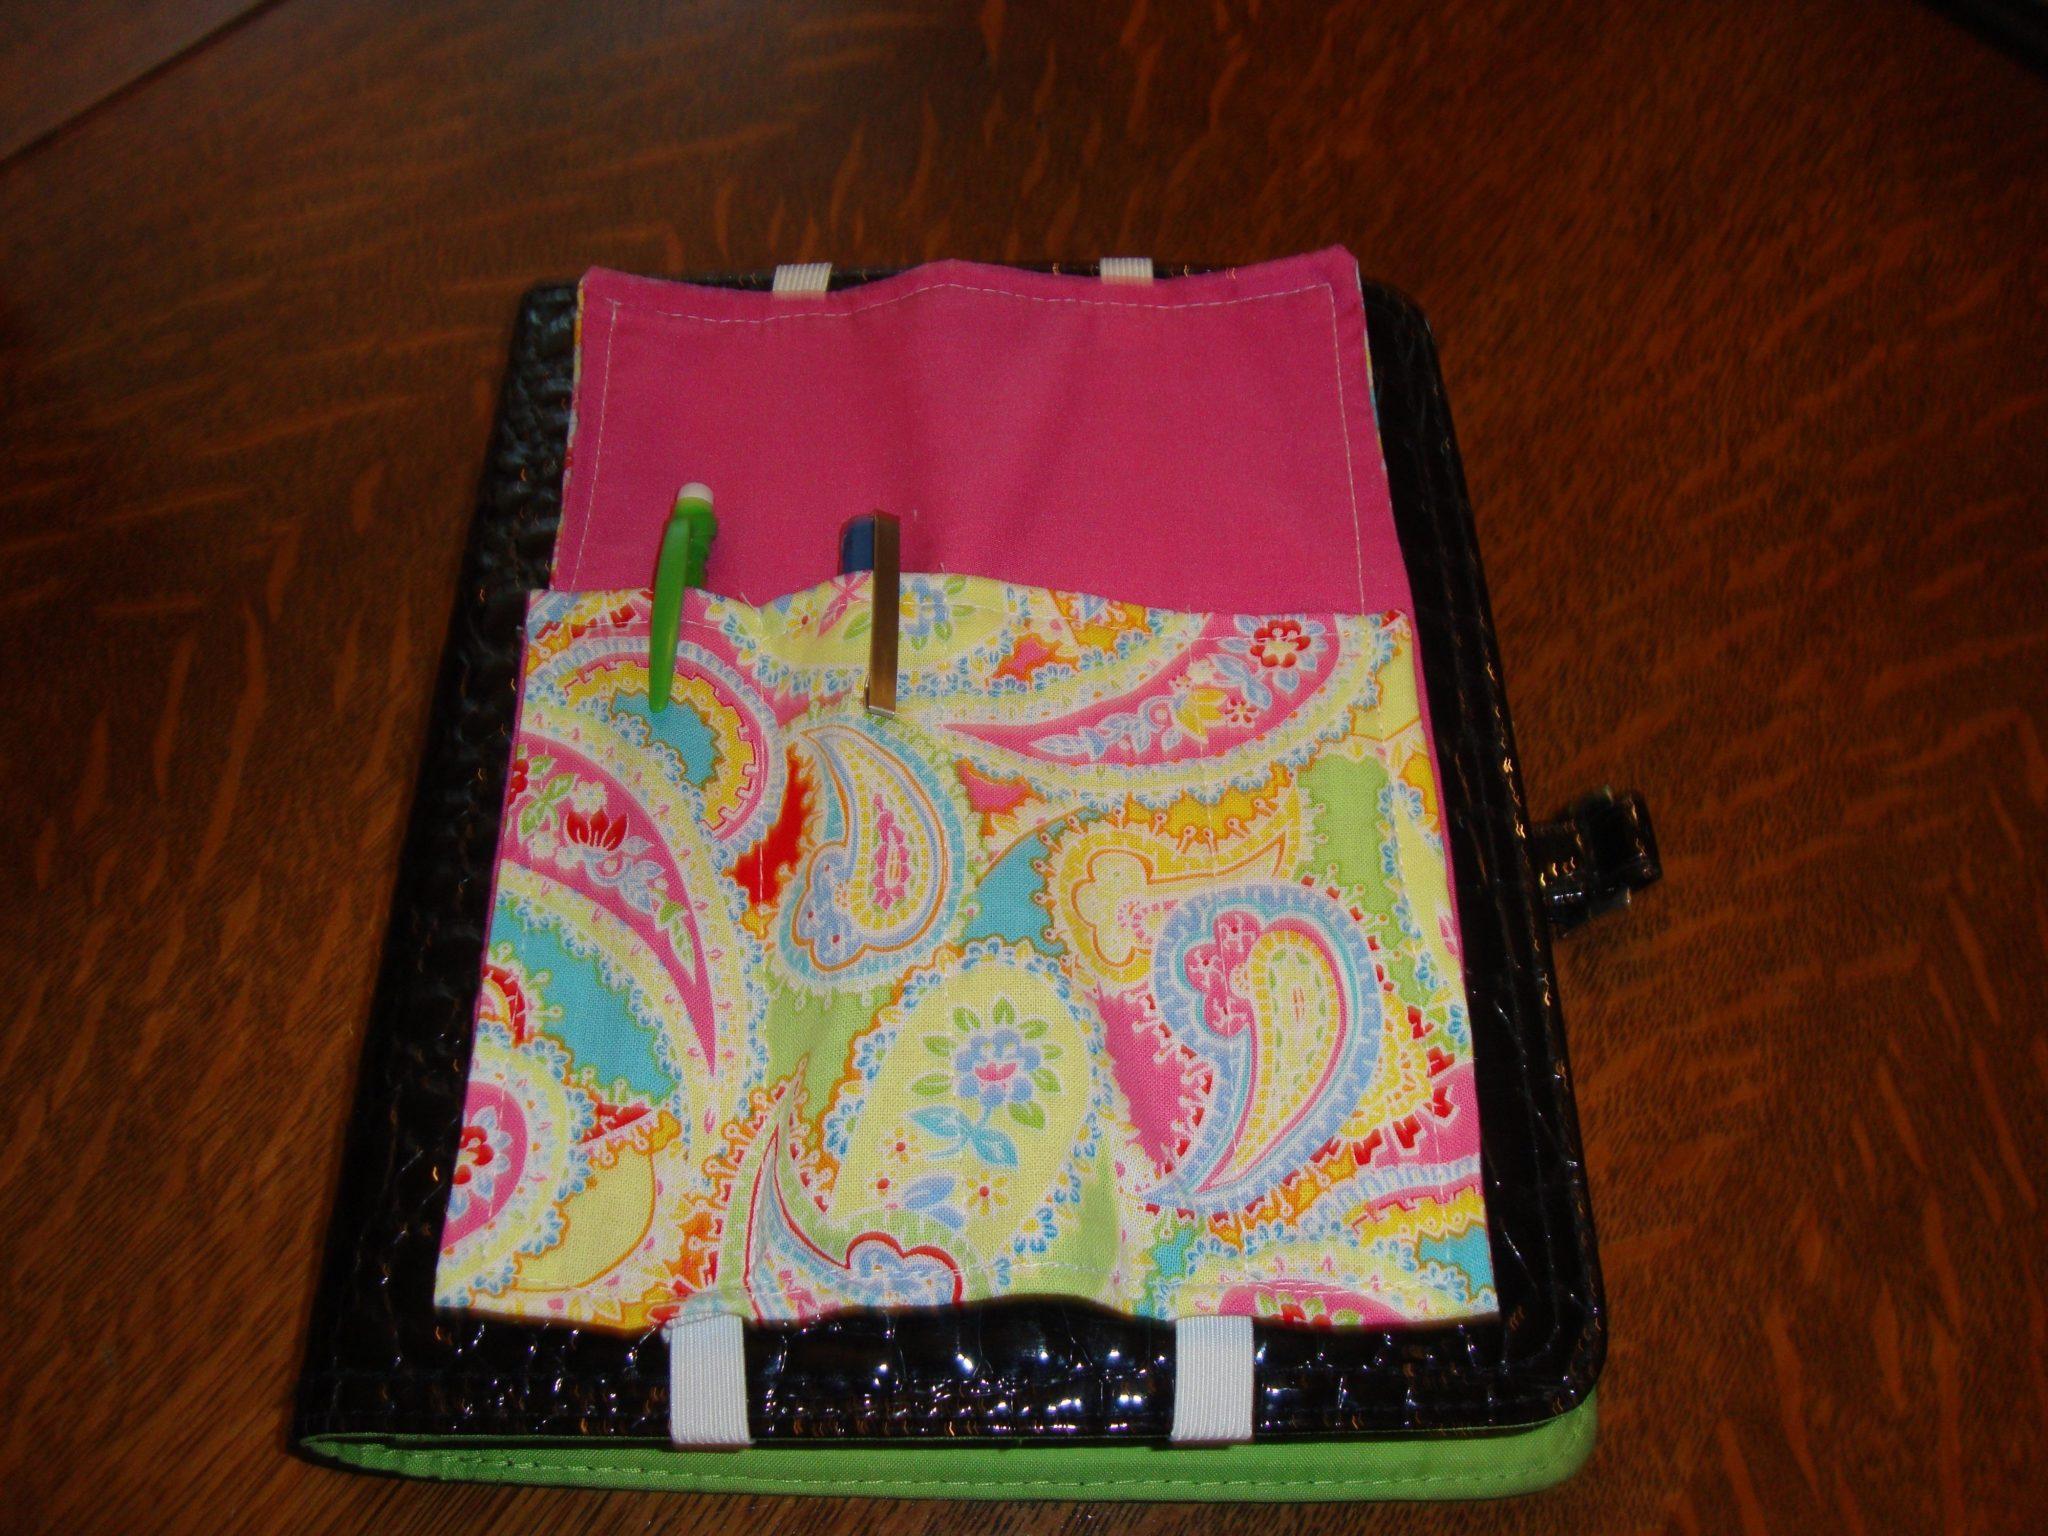 Pink Paisley pen quiver